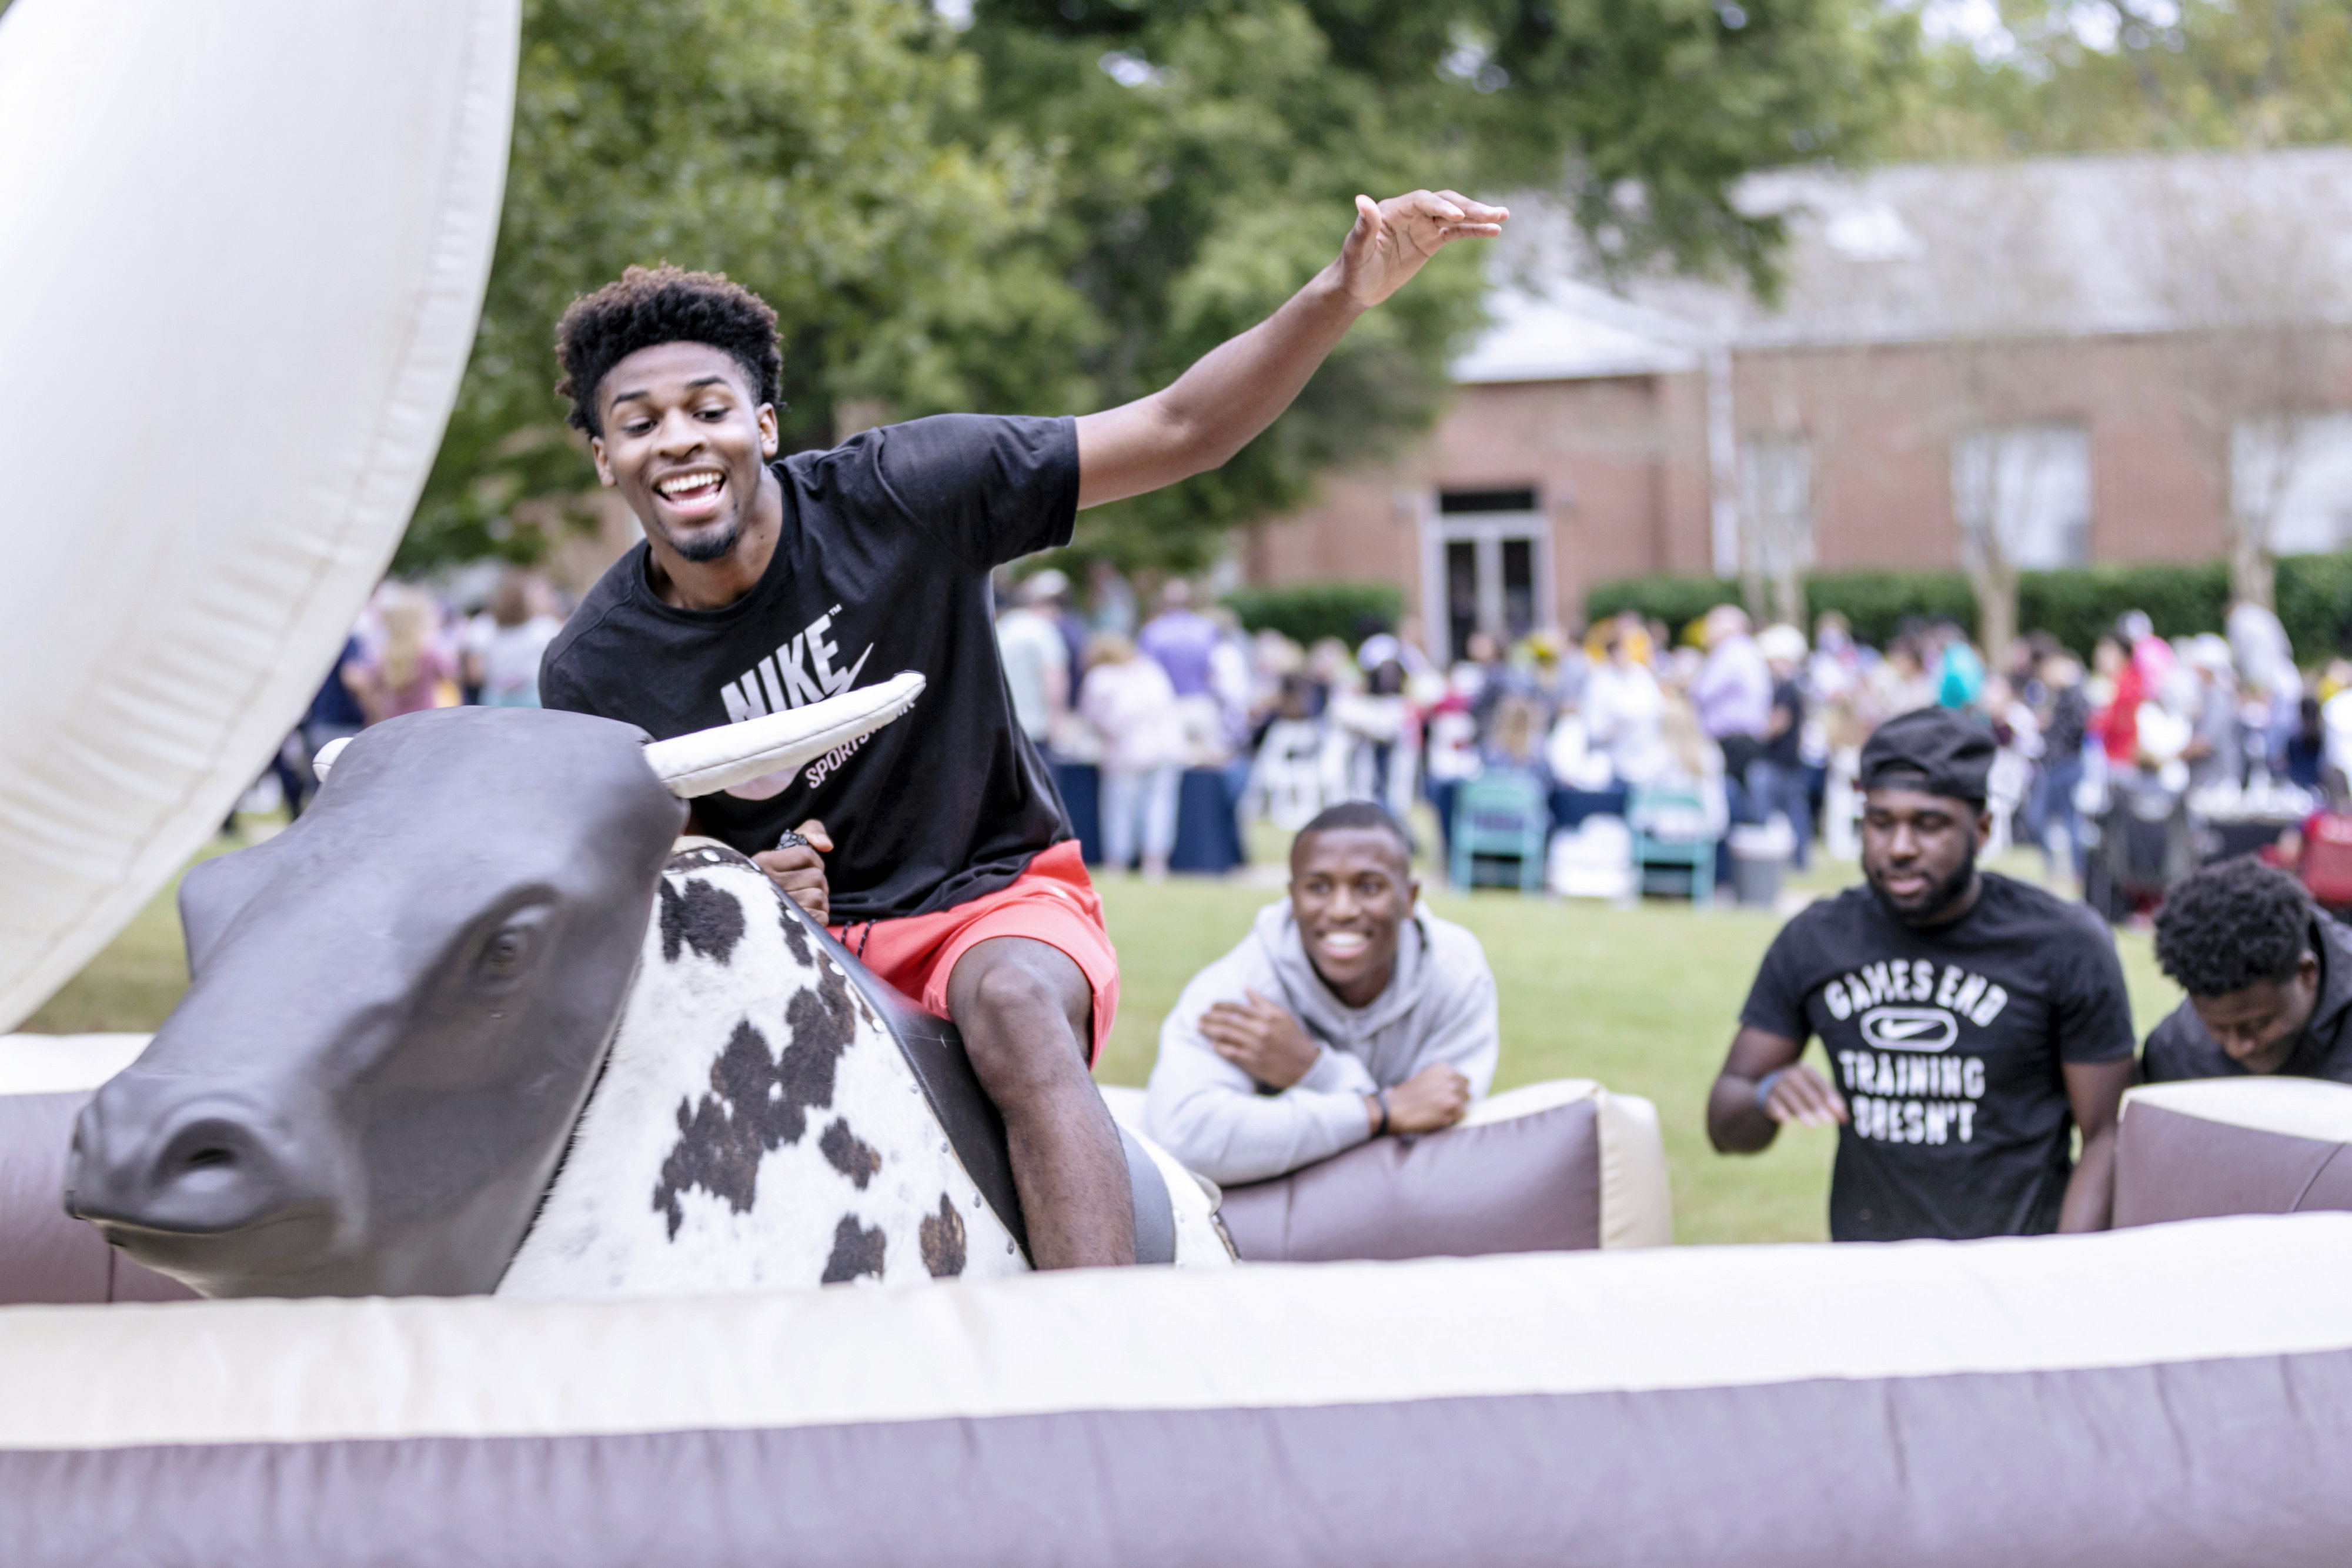 Student riding mechanical bull